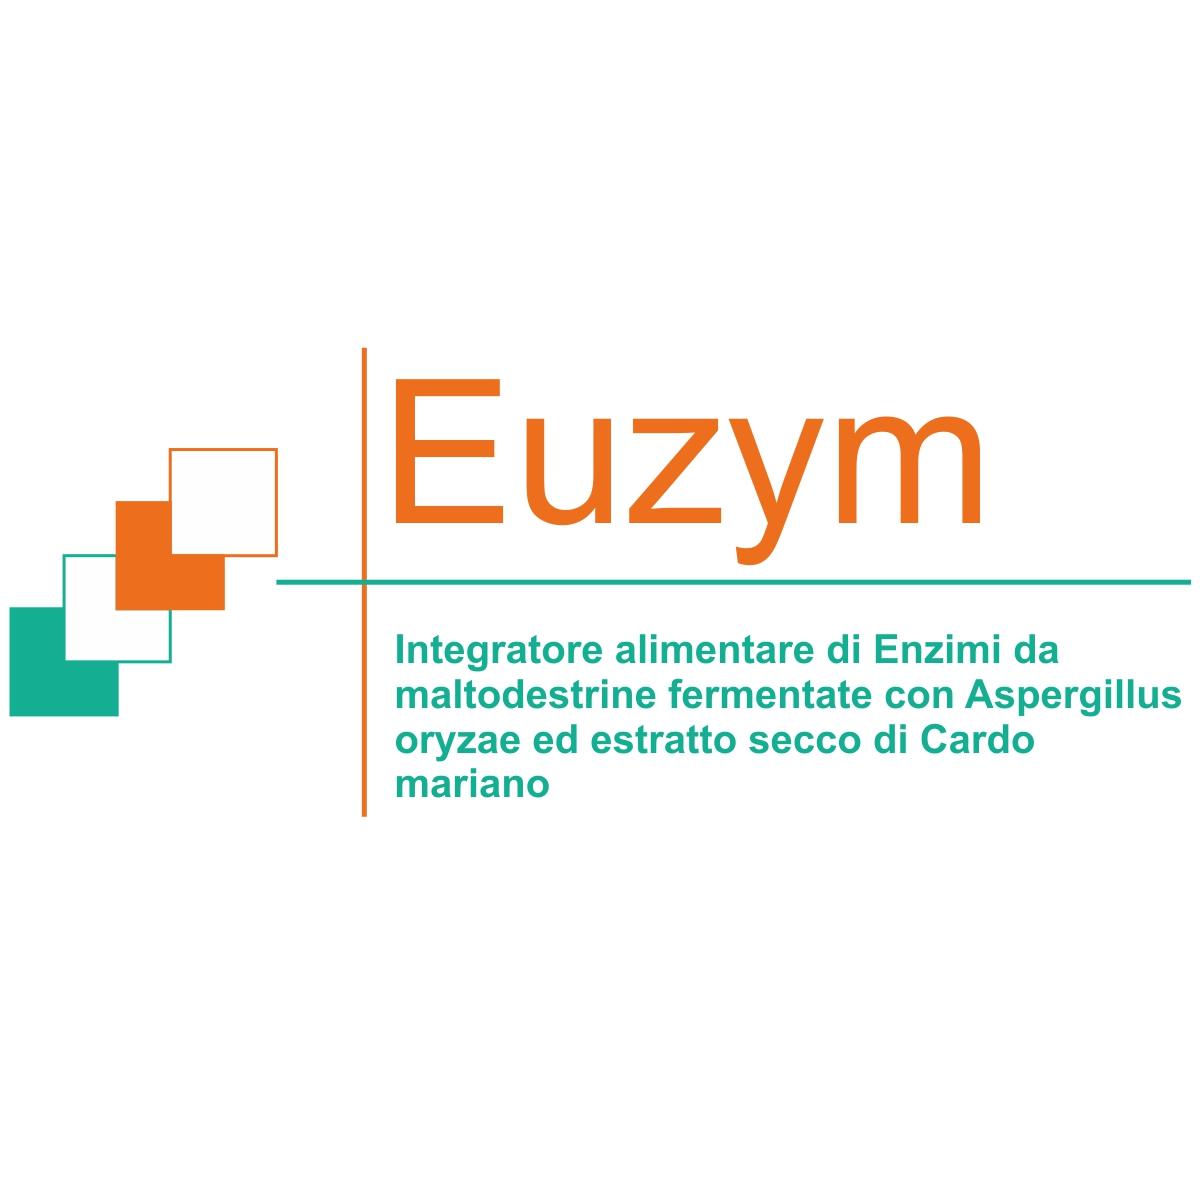 Logo Euzym Integratore